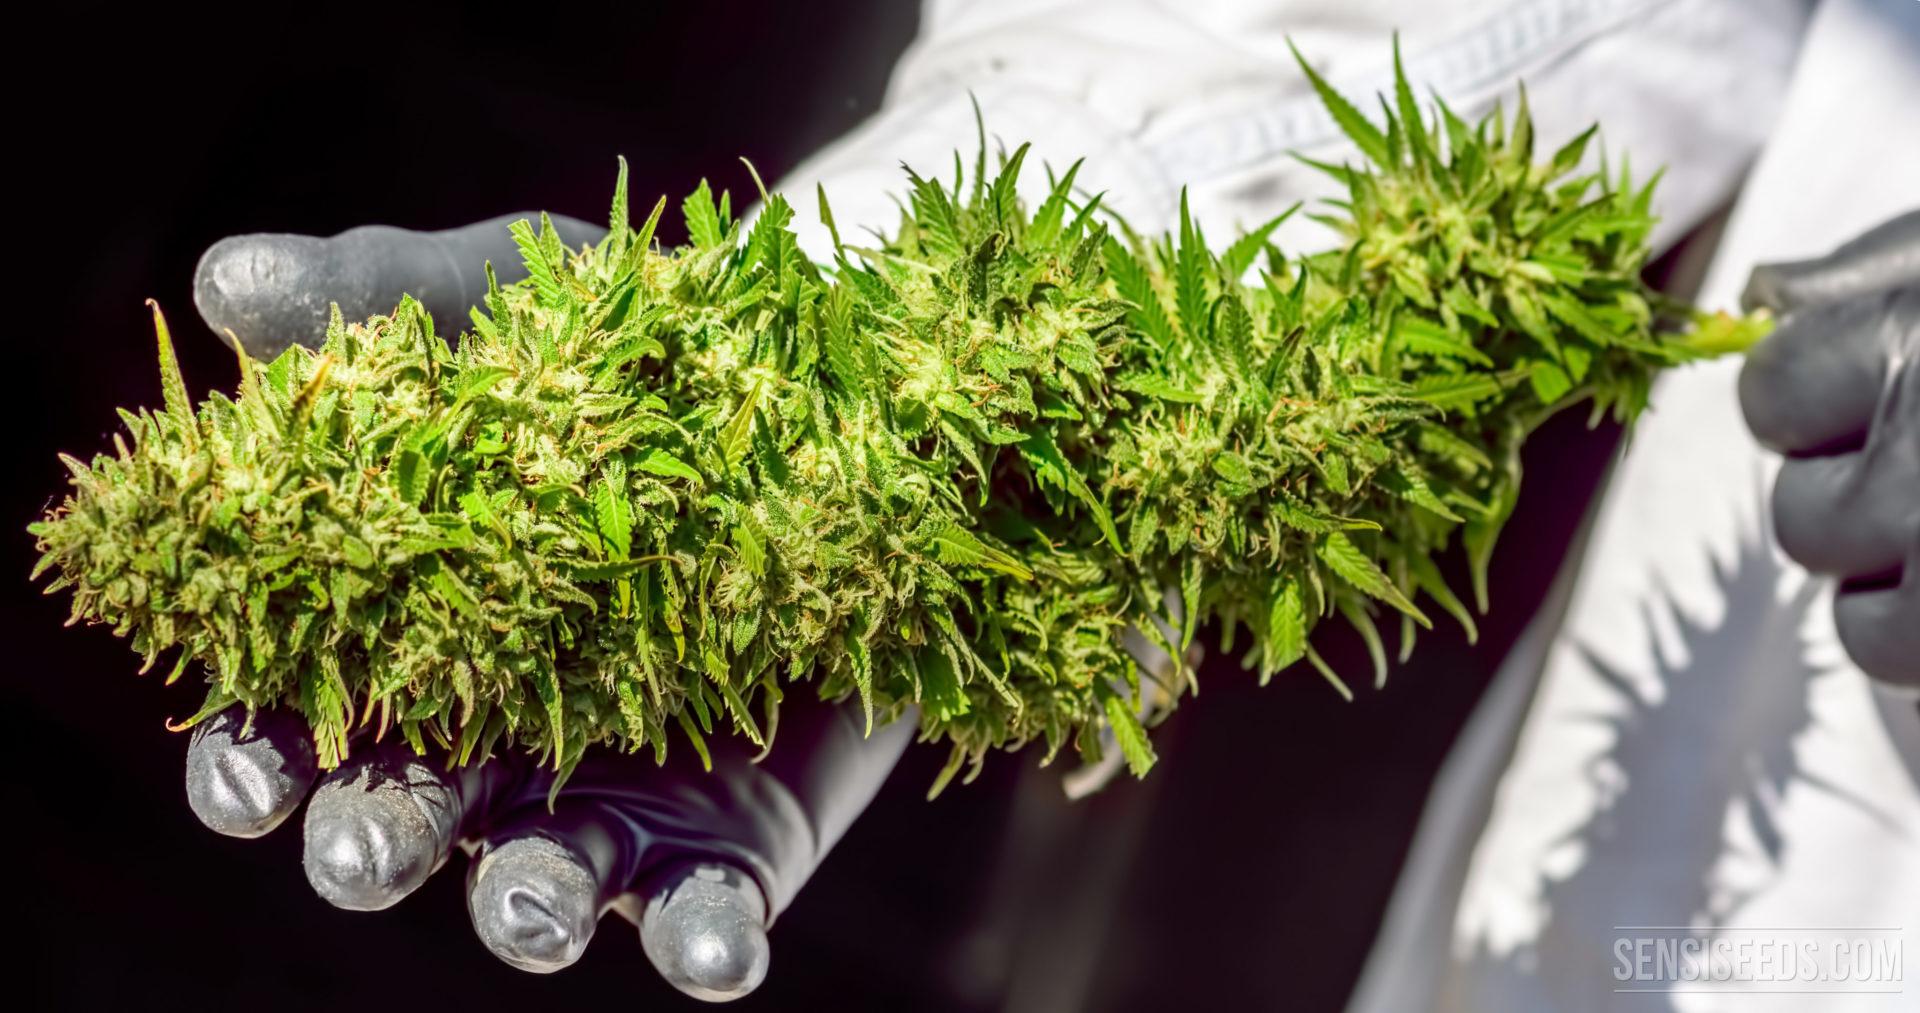 wie maximiert man den ertrag einer cannabis pflanze. Black Bedroom Furniture Sets. Home Design Ideas